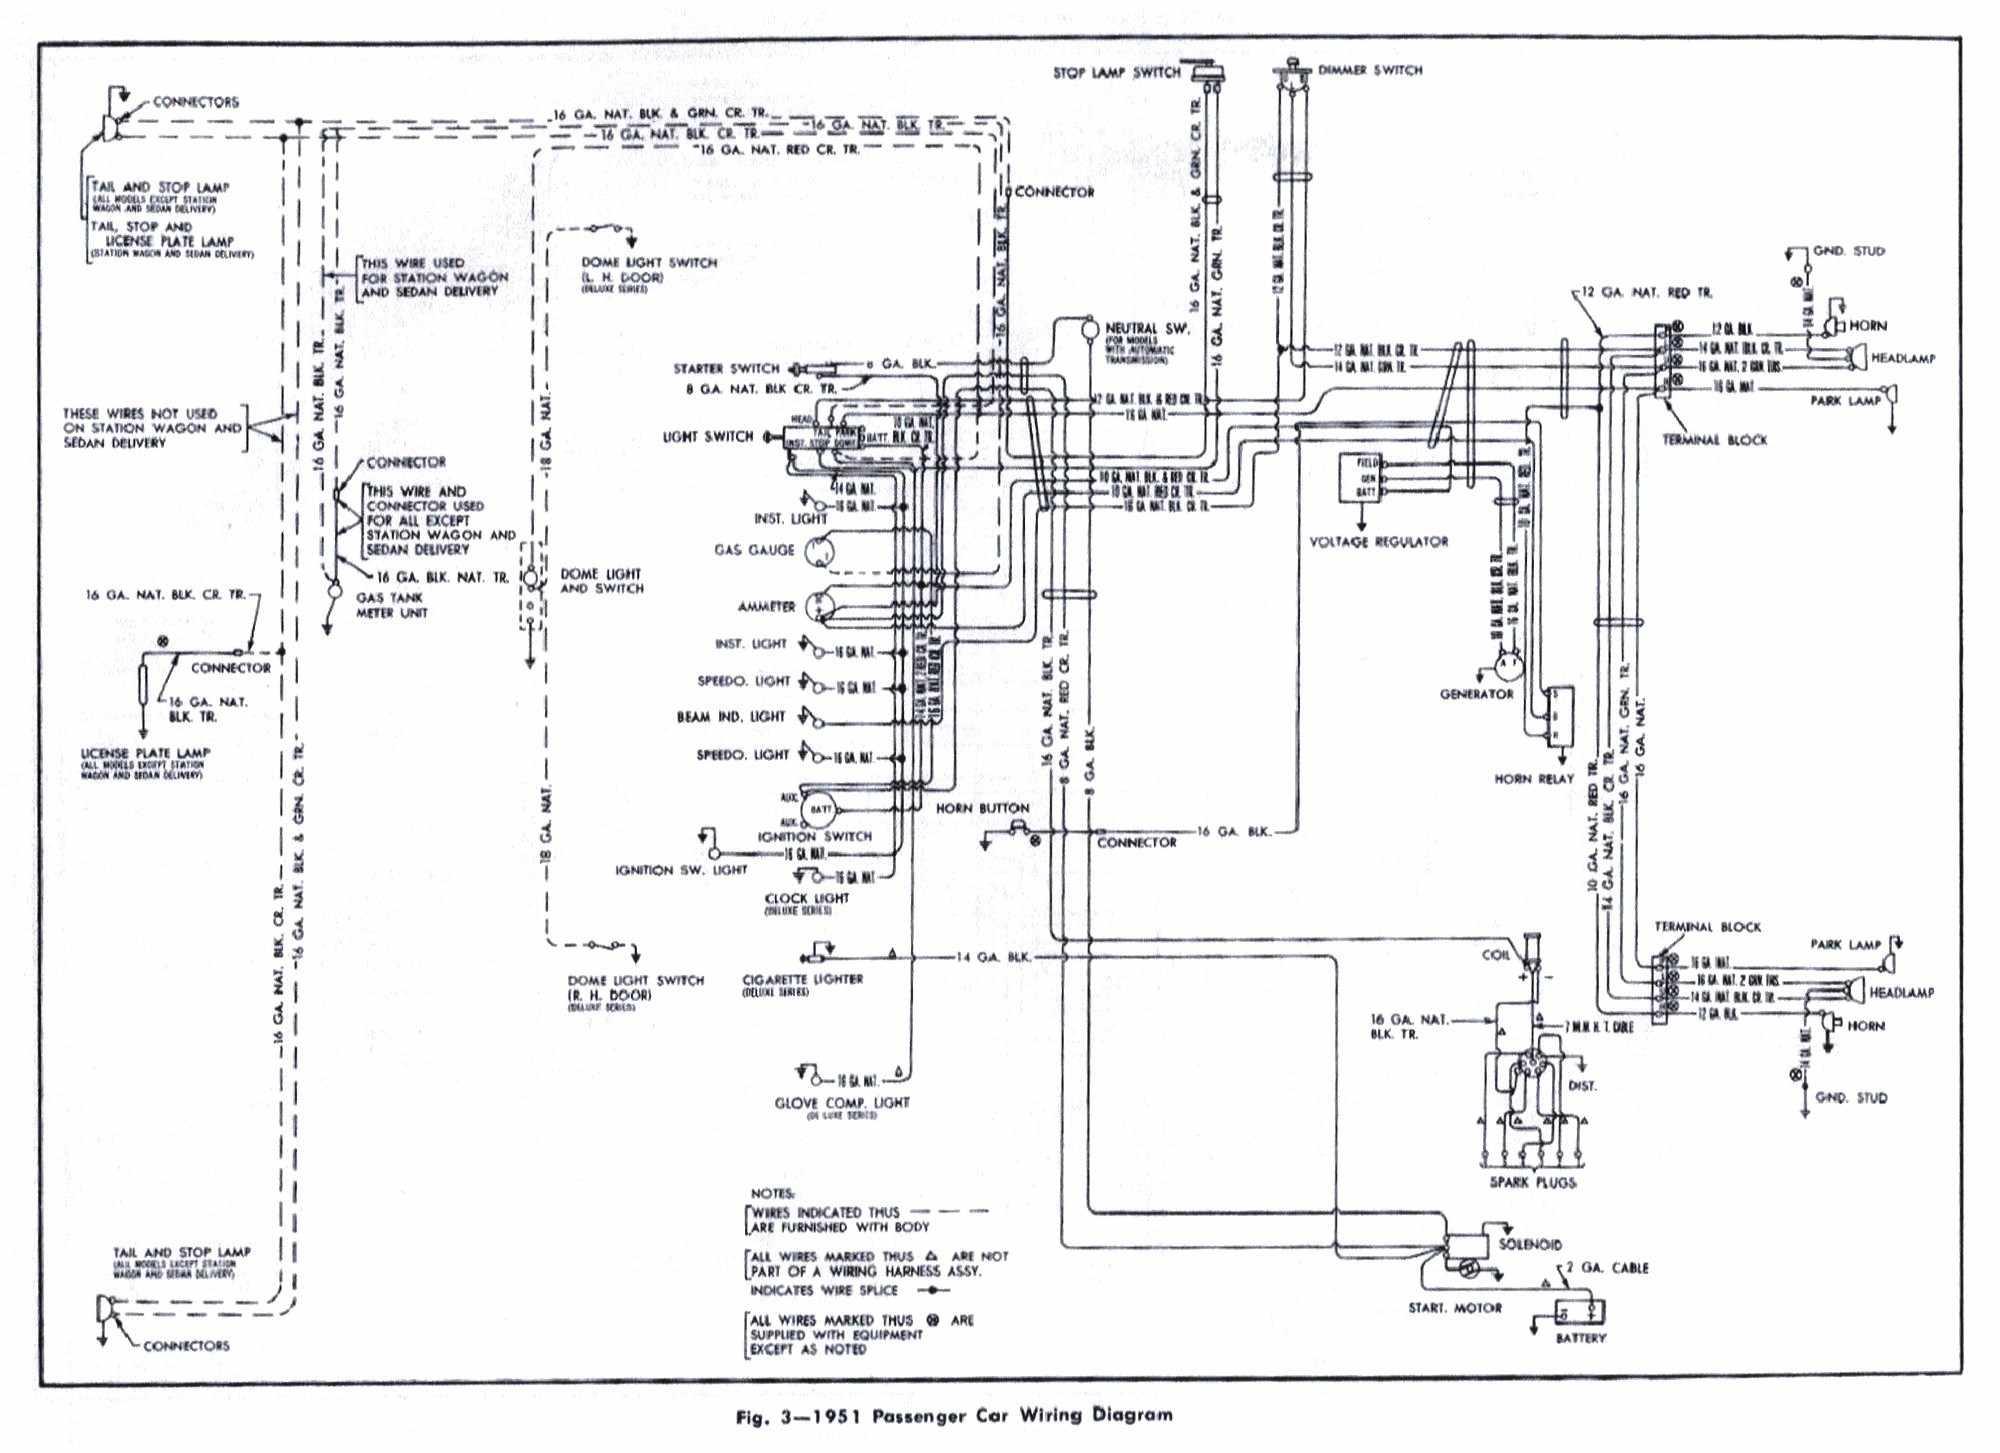 toyota wire diagram 7fdu32 forklift